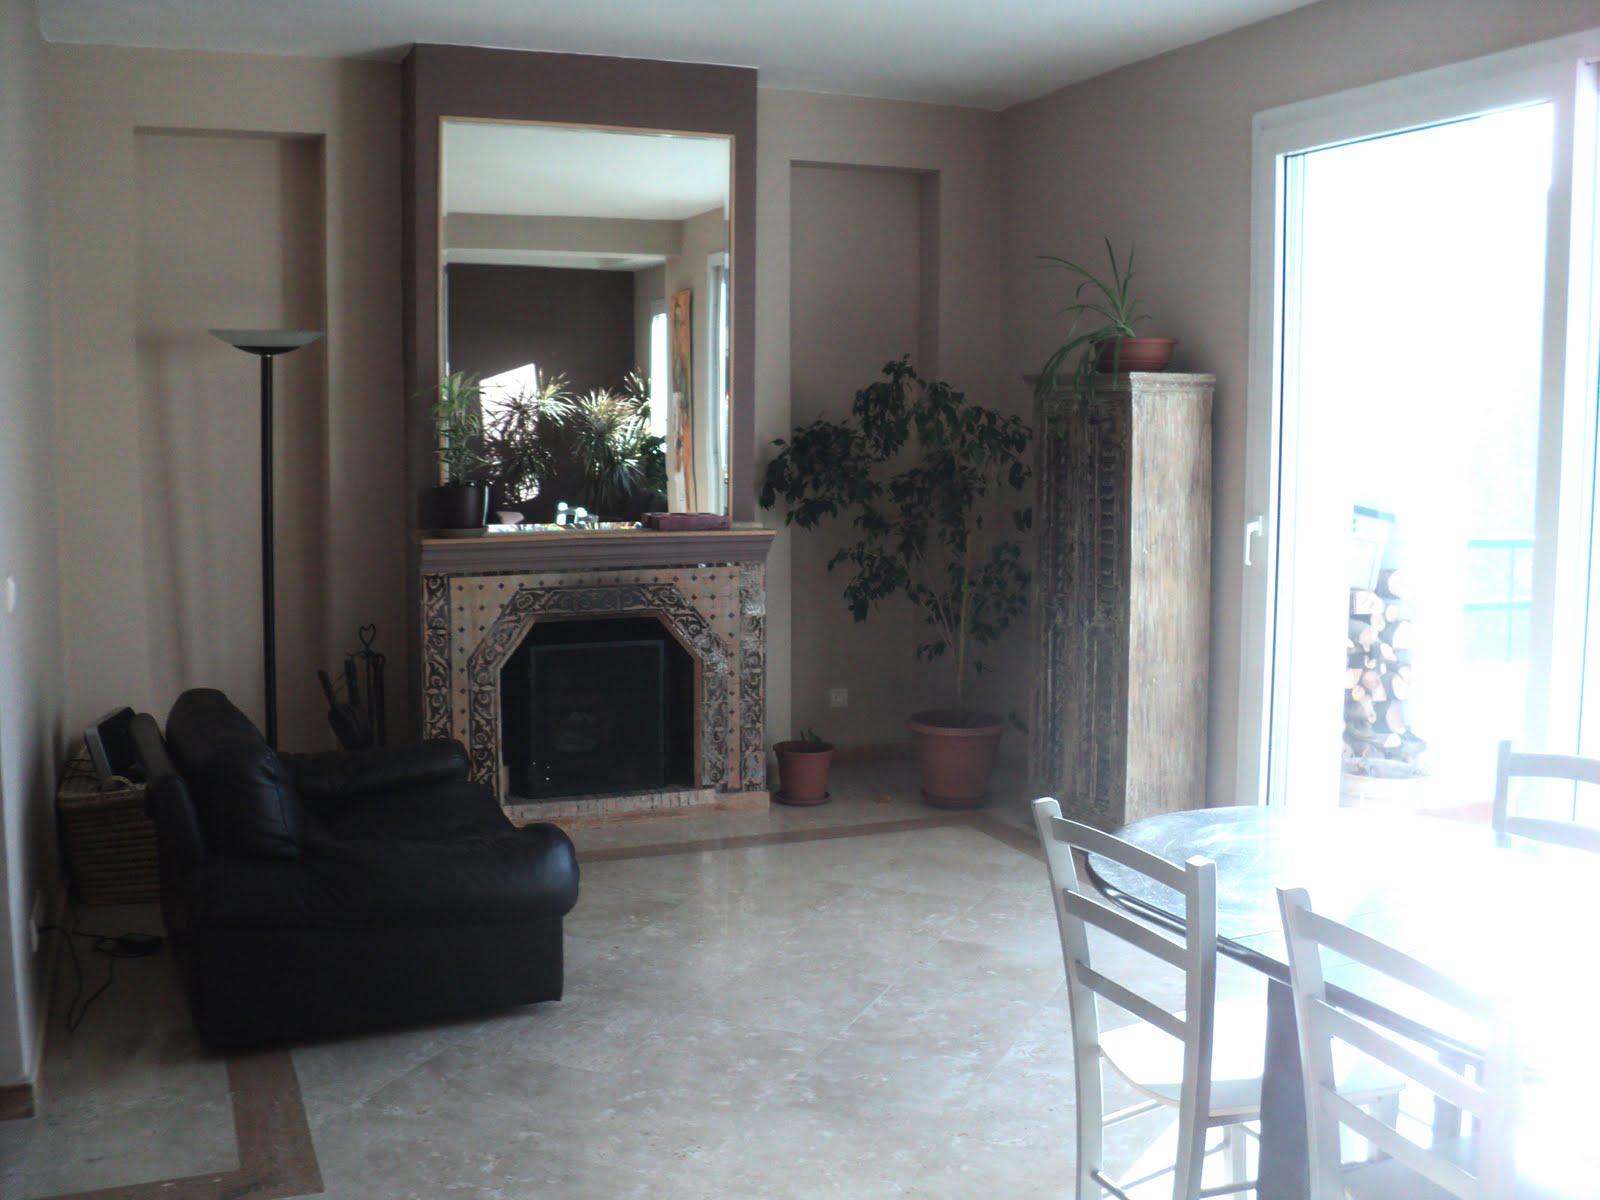 mes travaux coin cheminee avant apr s. Black Bedroom Furniture Sets. Home Design Ideas